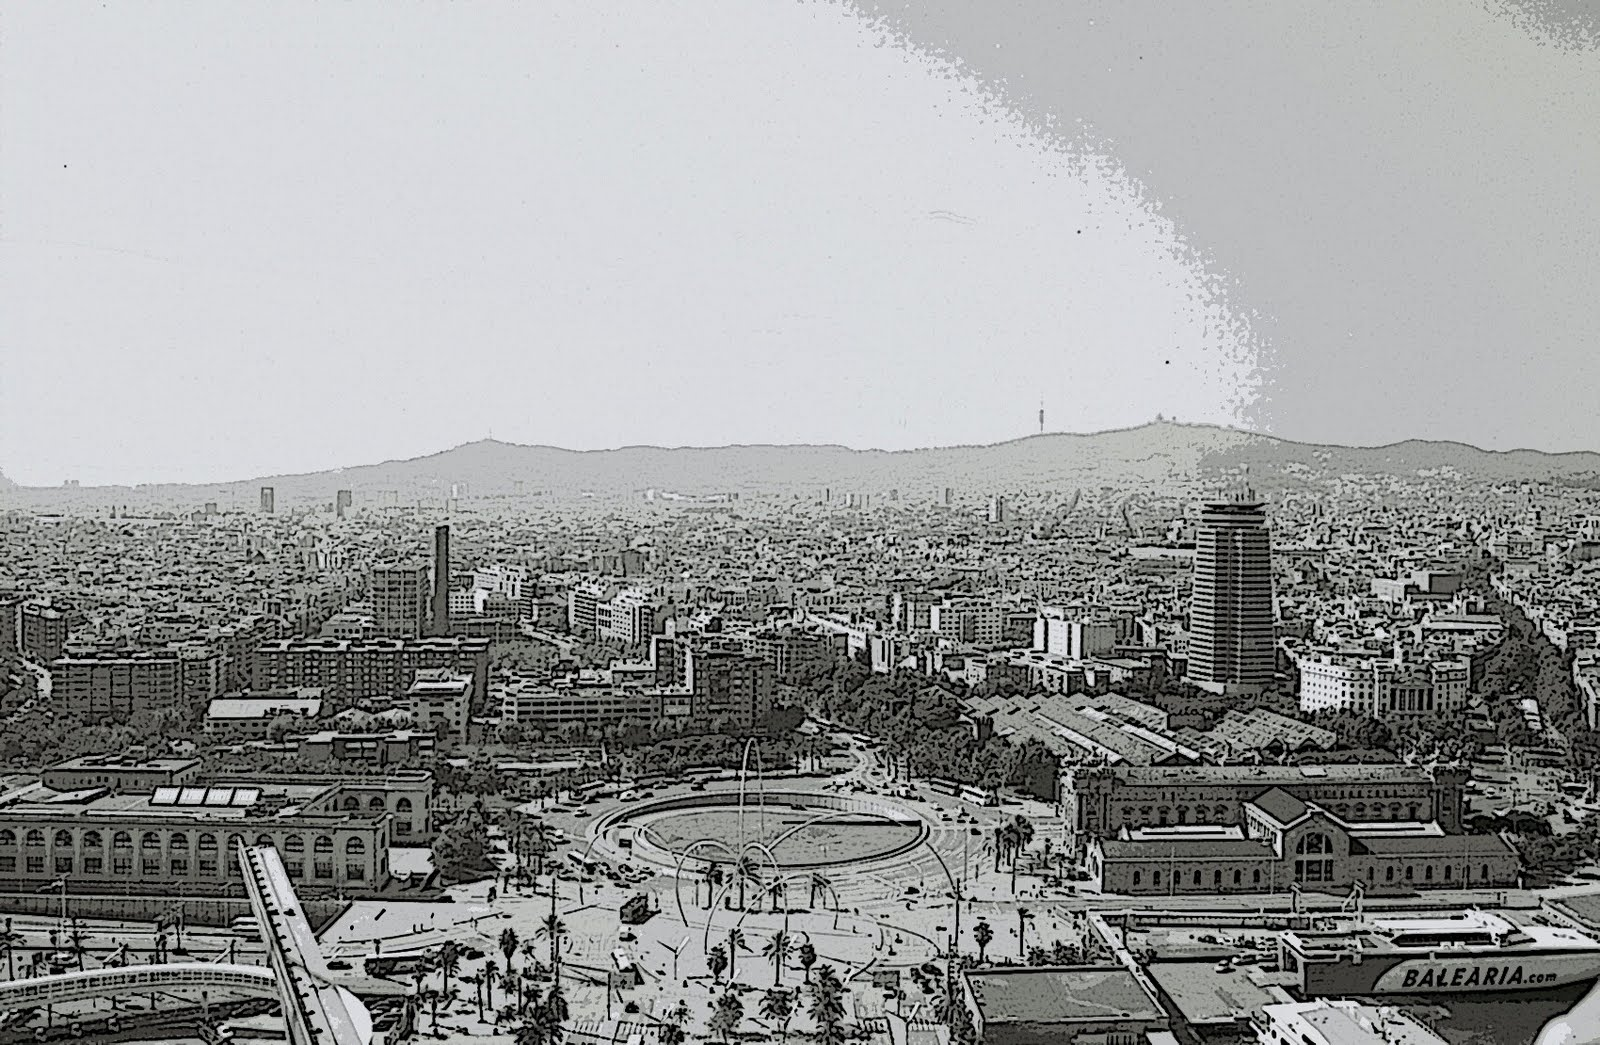 http://3.bp.blogspot.com/_kkLU82Lt8uQ/TC89OKShJtI/AAAAAAAACCg/3Xheh8FSZr4/s1600/Barcelona+city.jpg